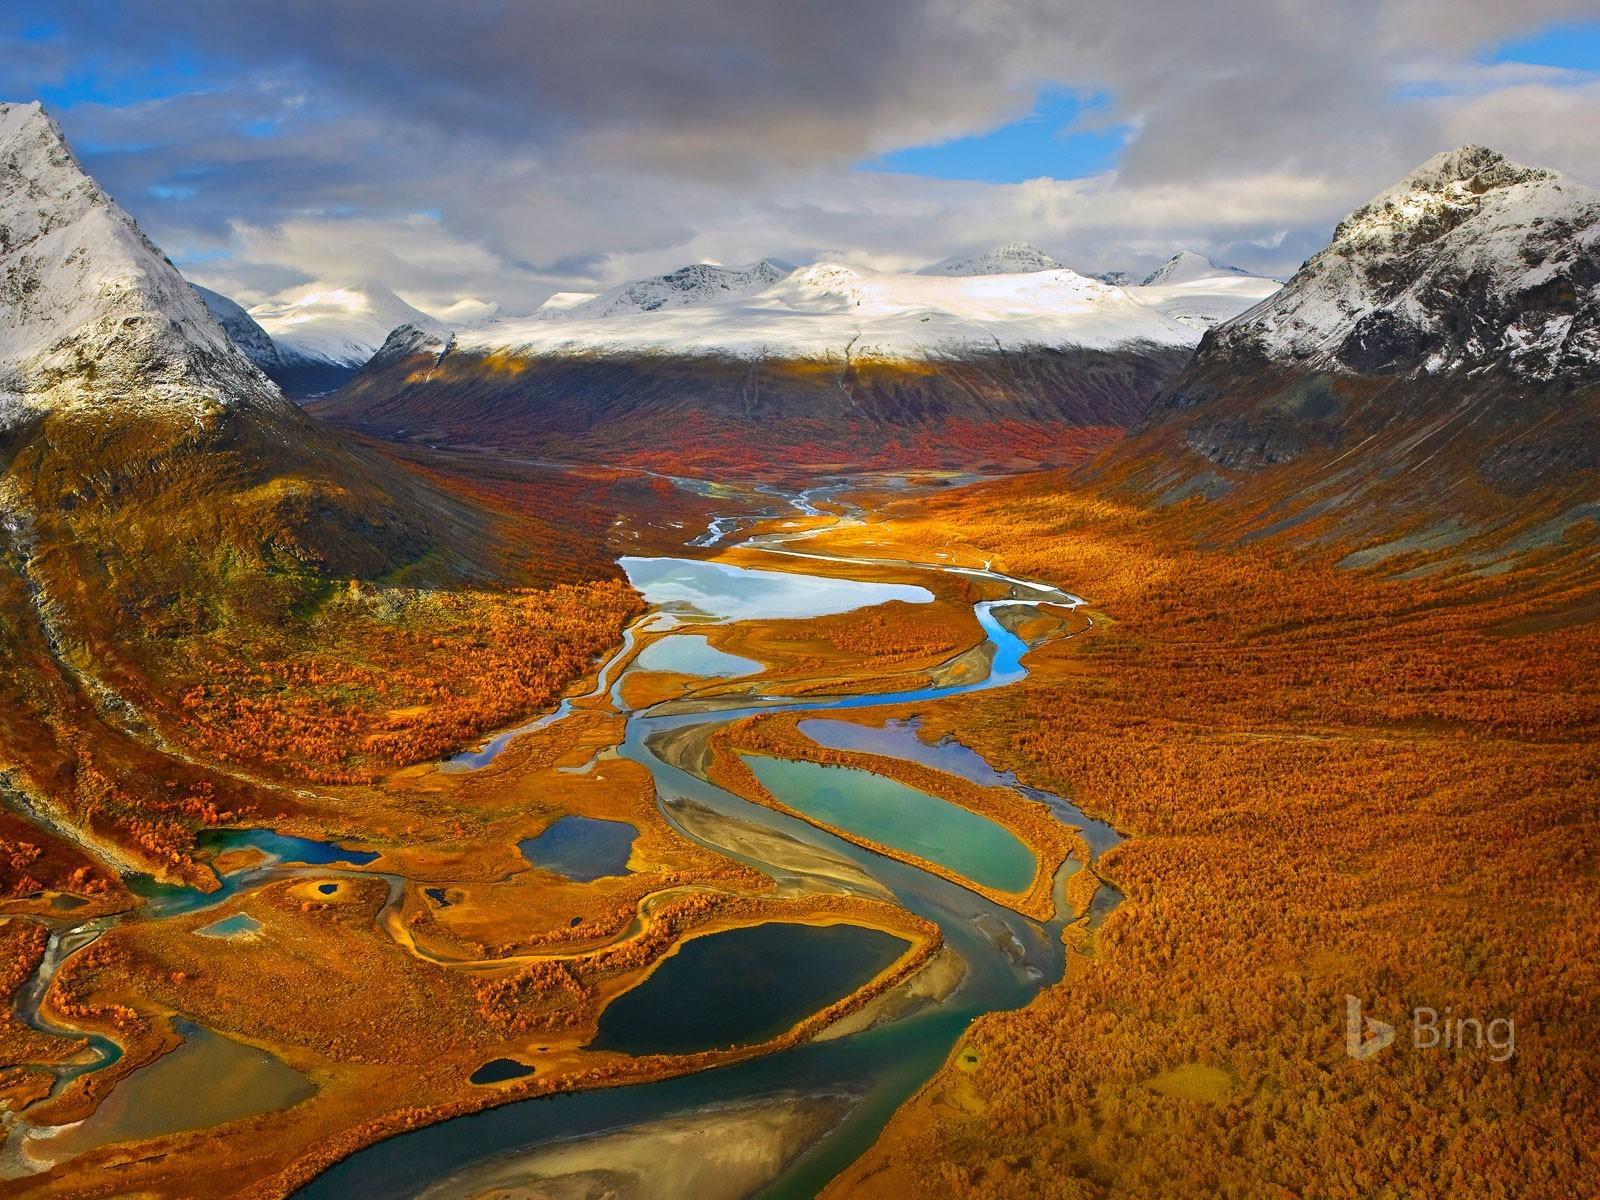 Sweden The Rapa Valley In Sarek National Park 2017 Bing